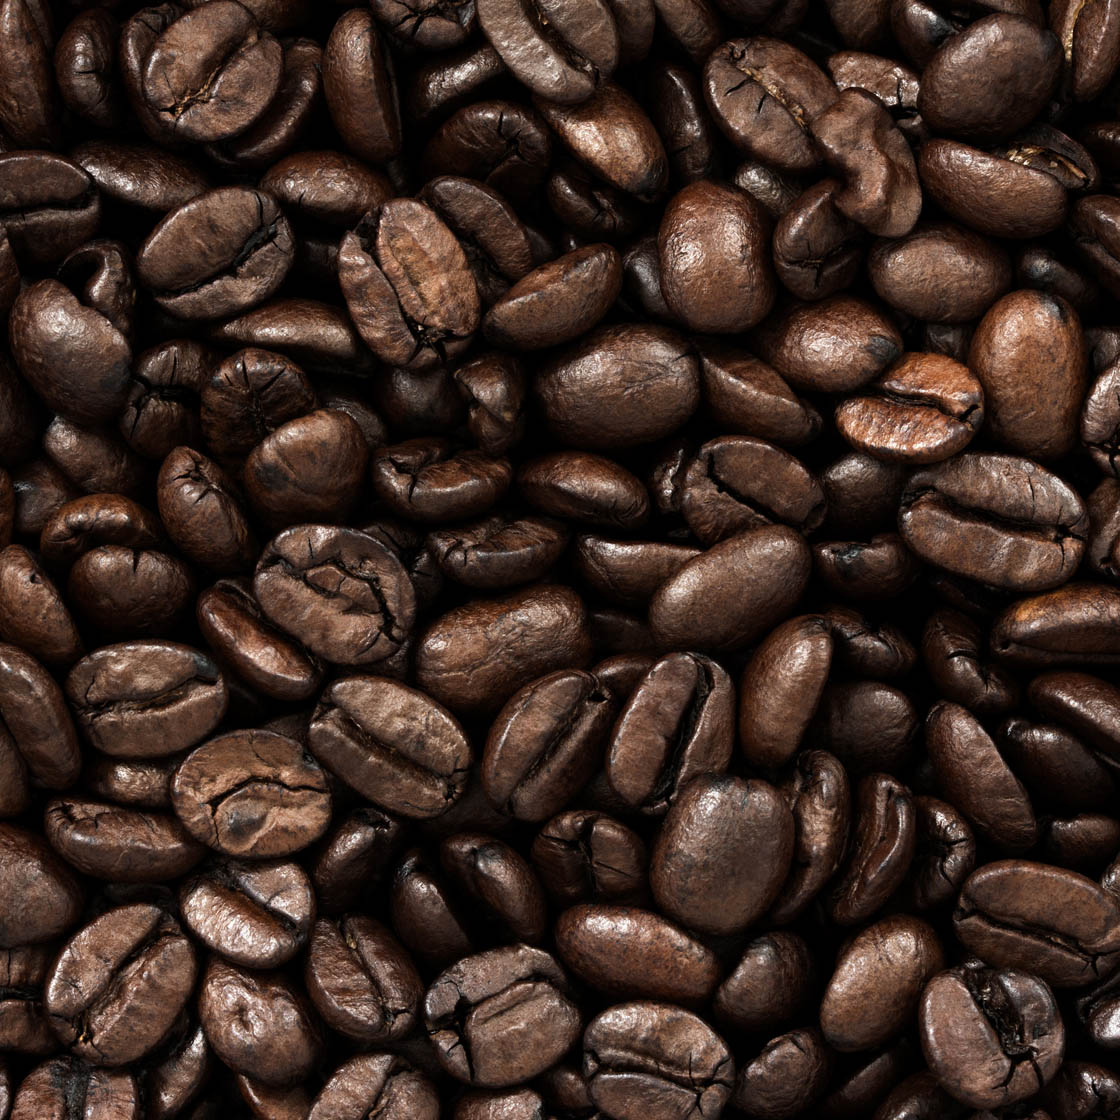 Brazilian Coffee Medium Roast (Rainforest Alliance) - Coffee Beans